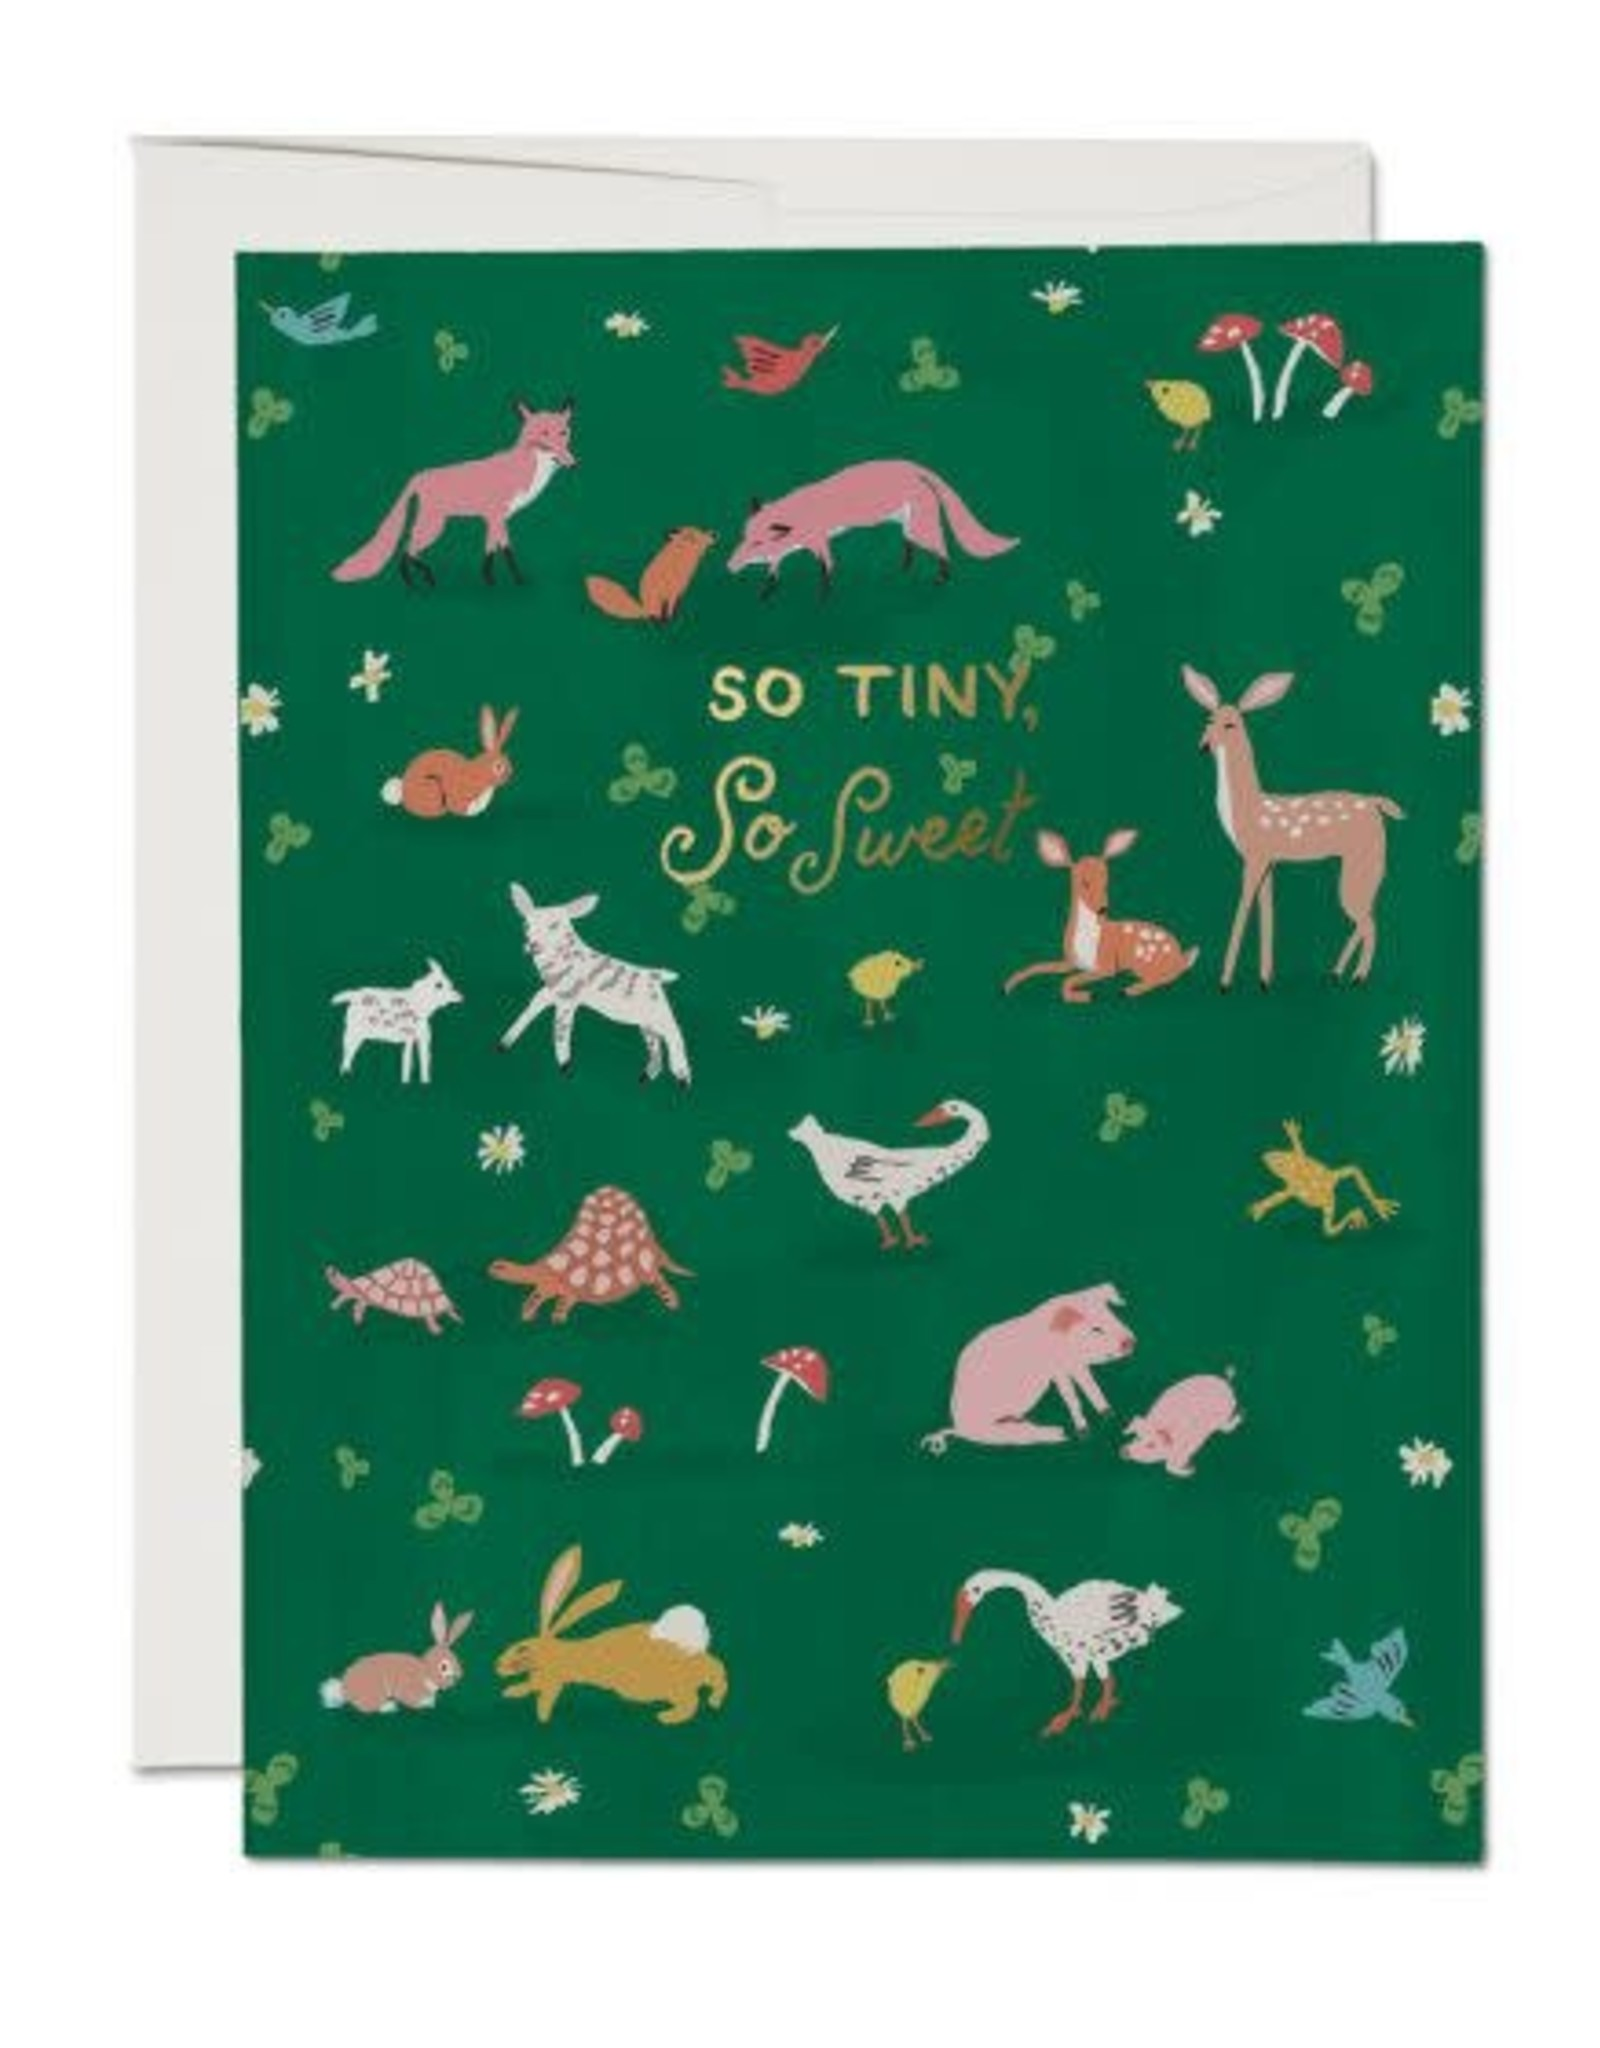 So Tiny, So Sweet Baby Animals Greeting Card